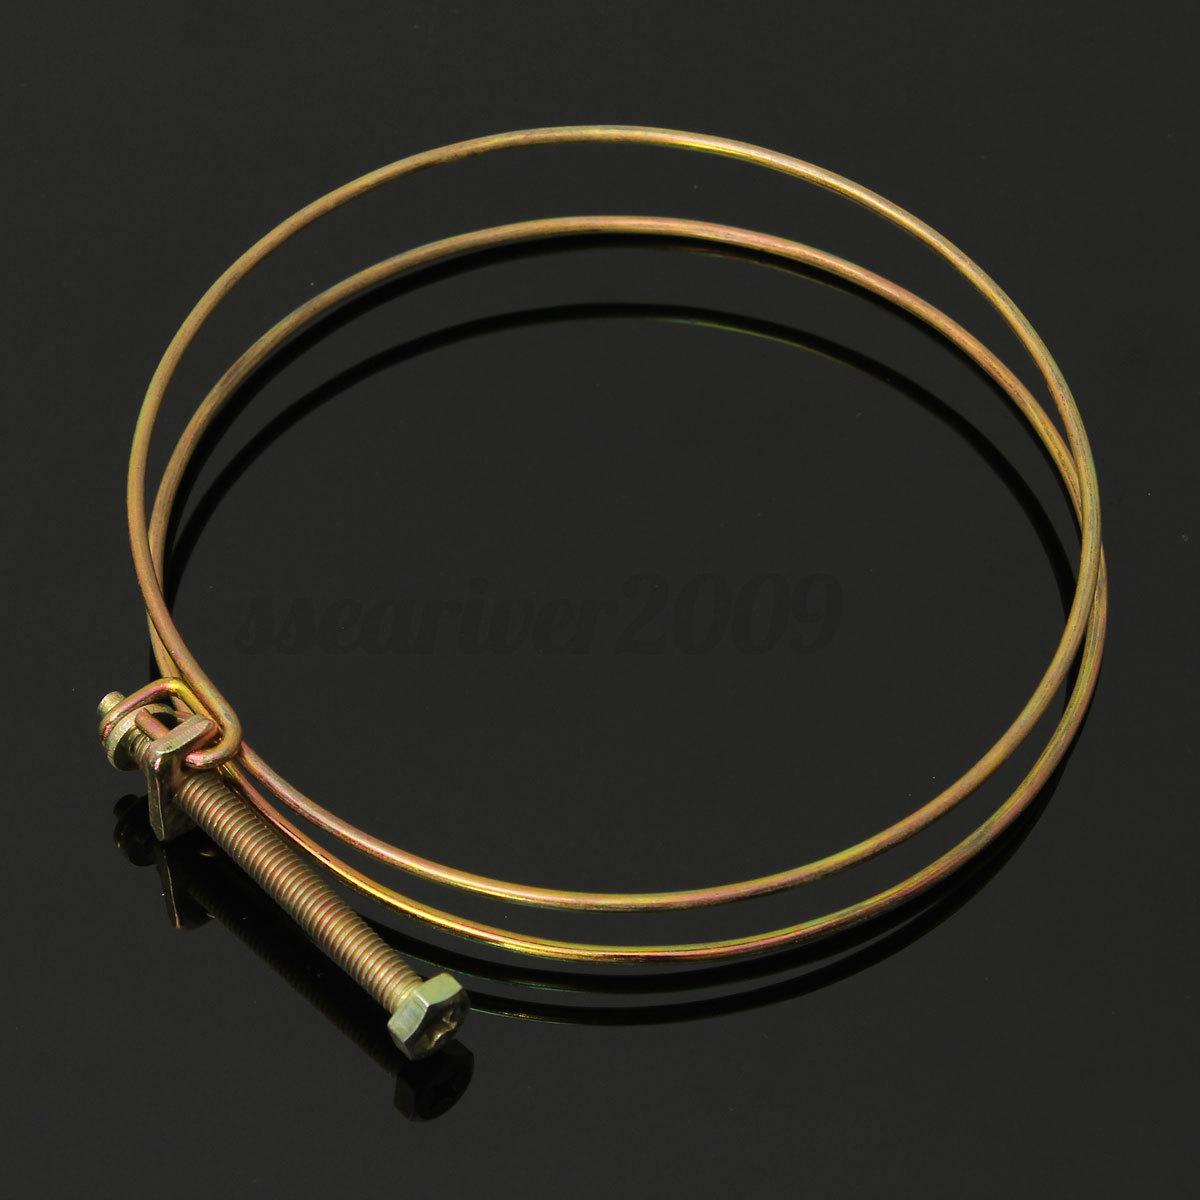 Double wire hose clamp pipe clip screw bolt tight